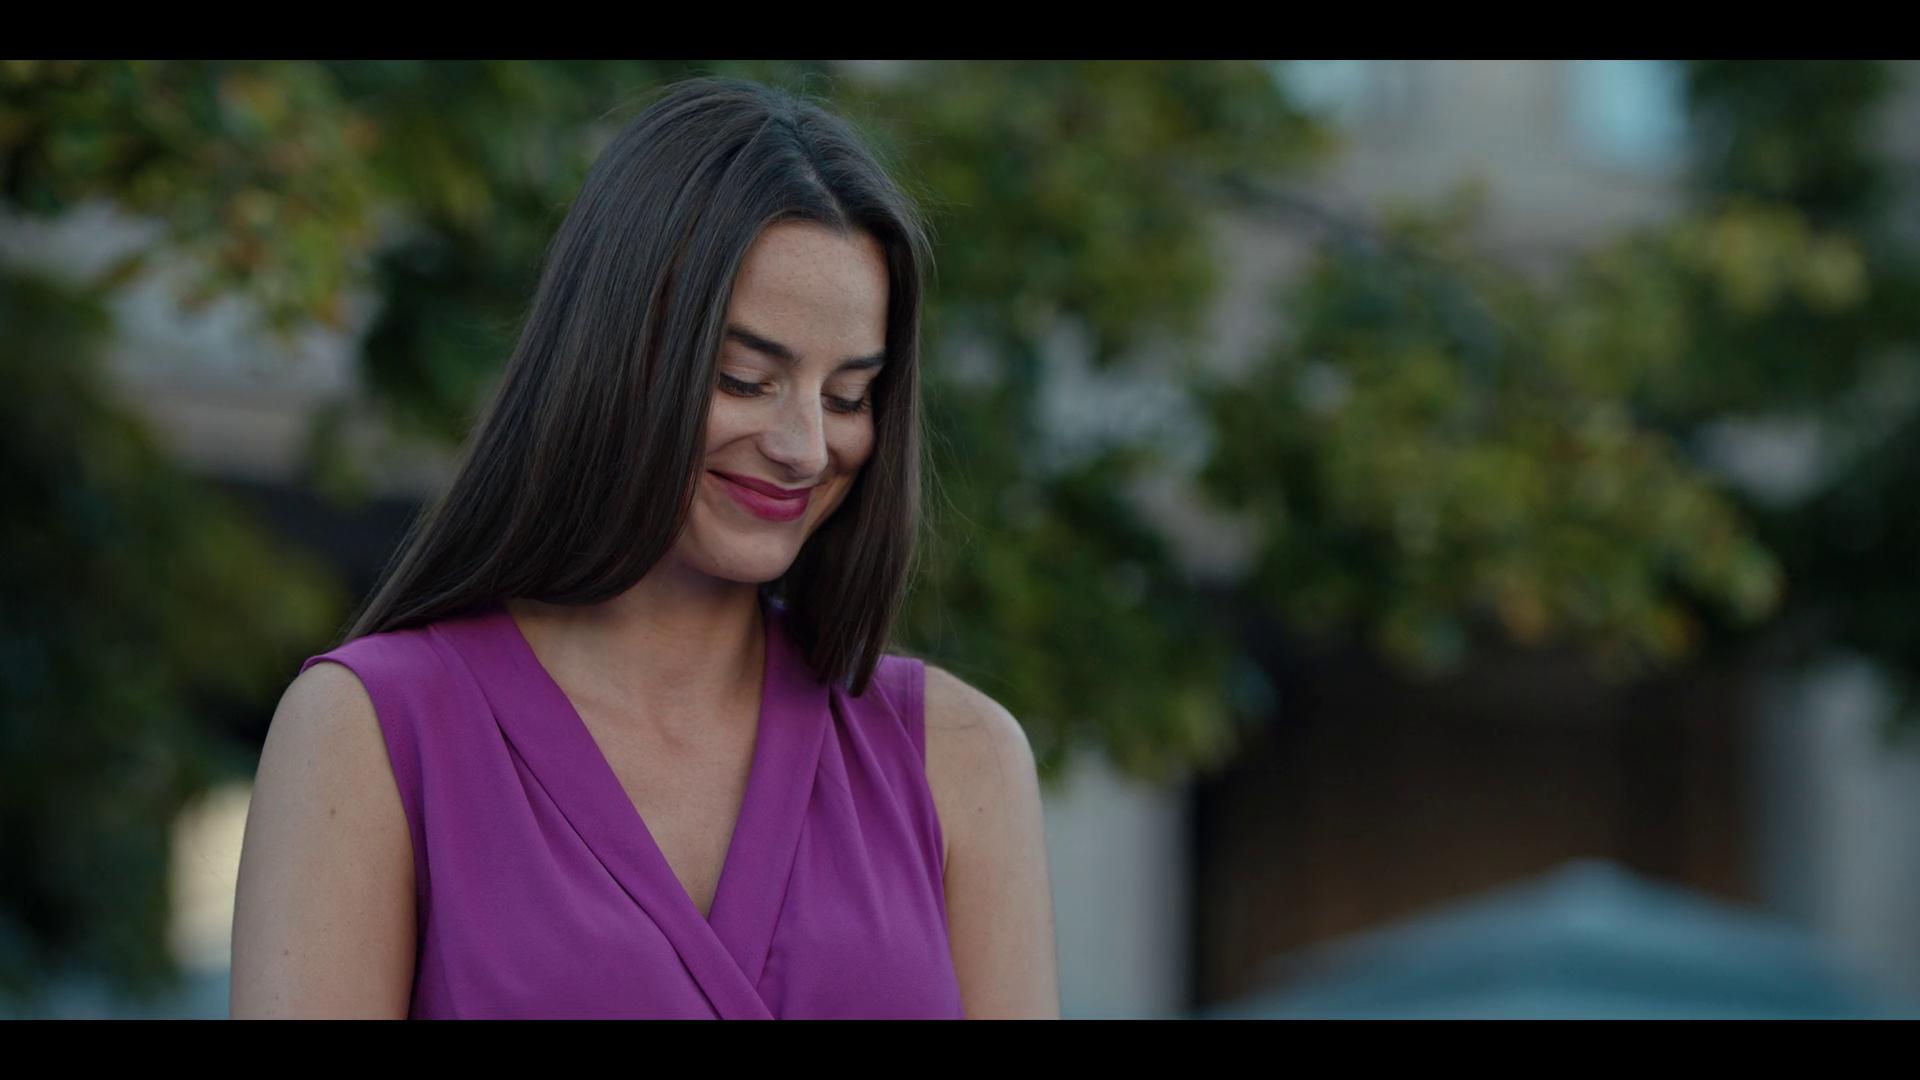 Amor al cuadrado (2021) 1080p WEB-DL Latino